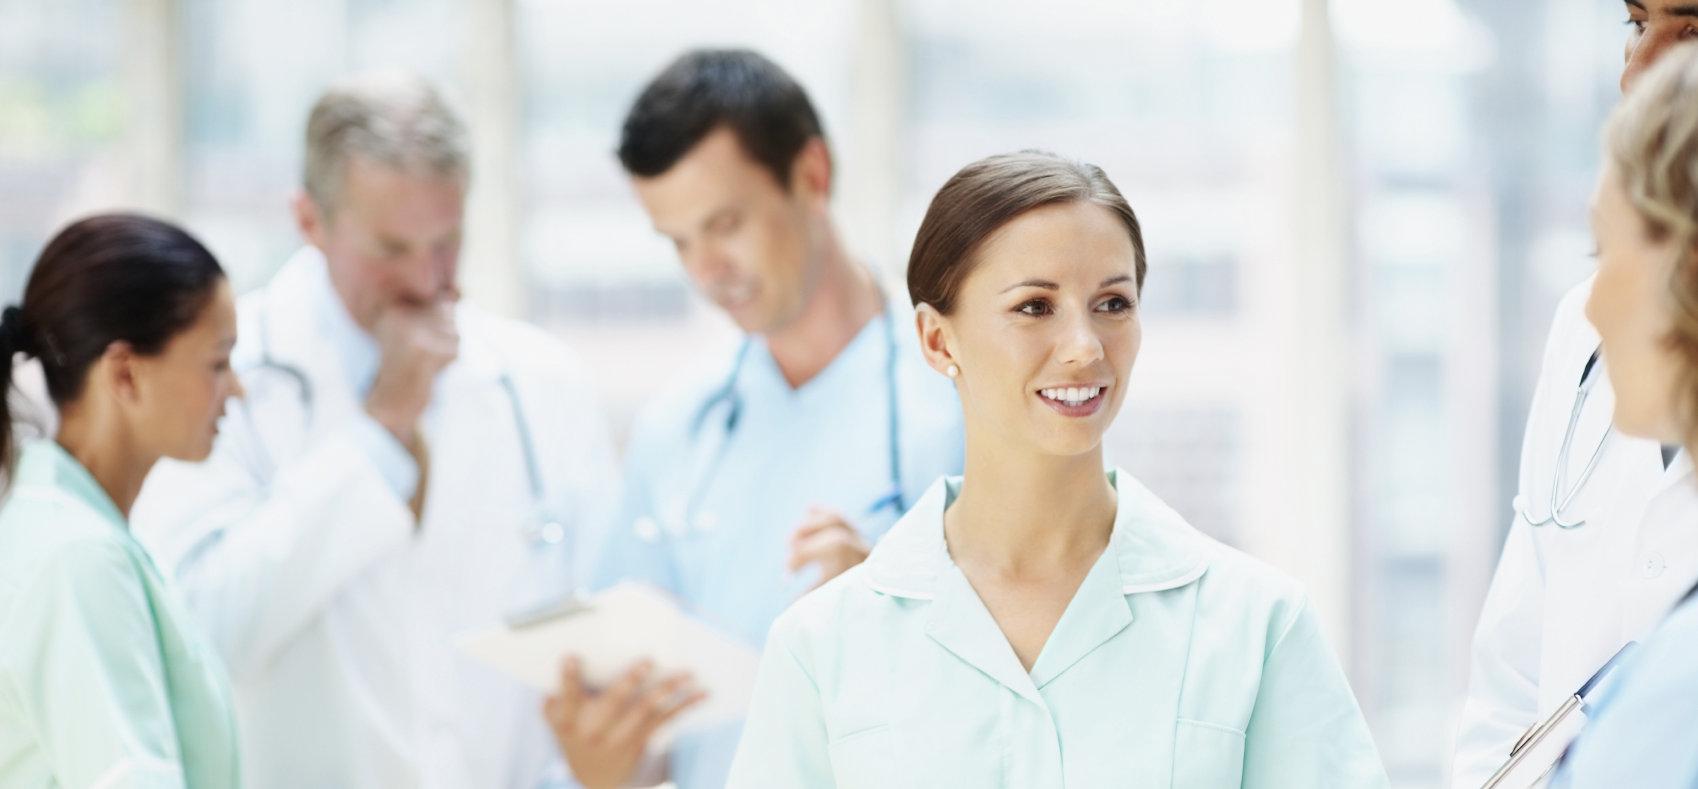 esgena  u2013 european society of gastroenterology and endoscopy nurses and associates